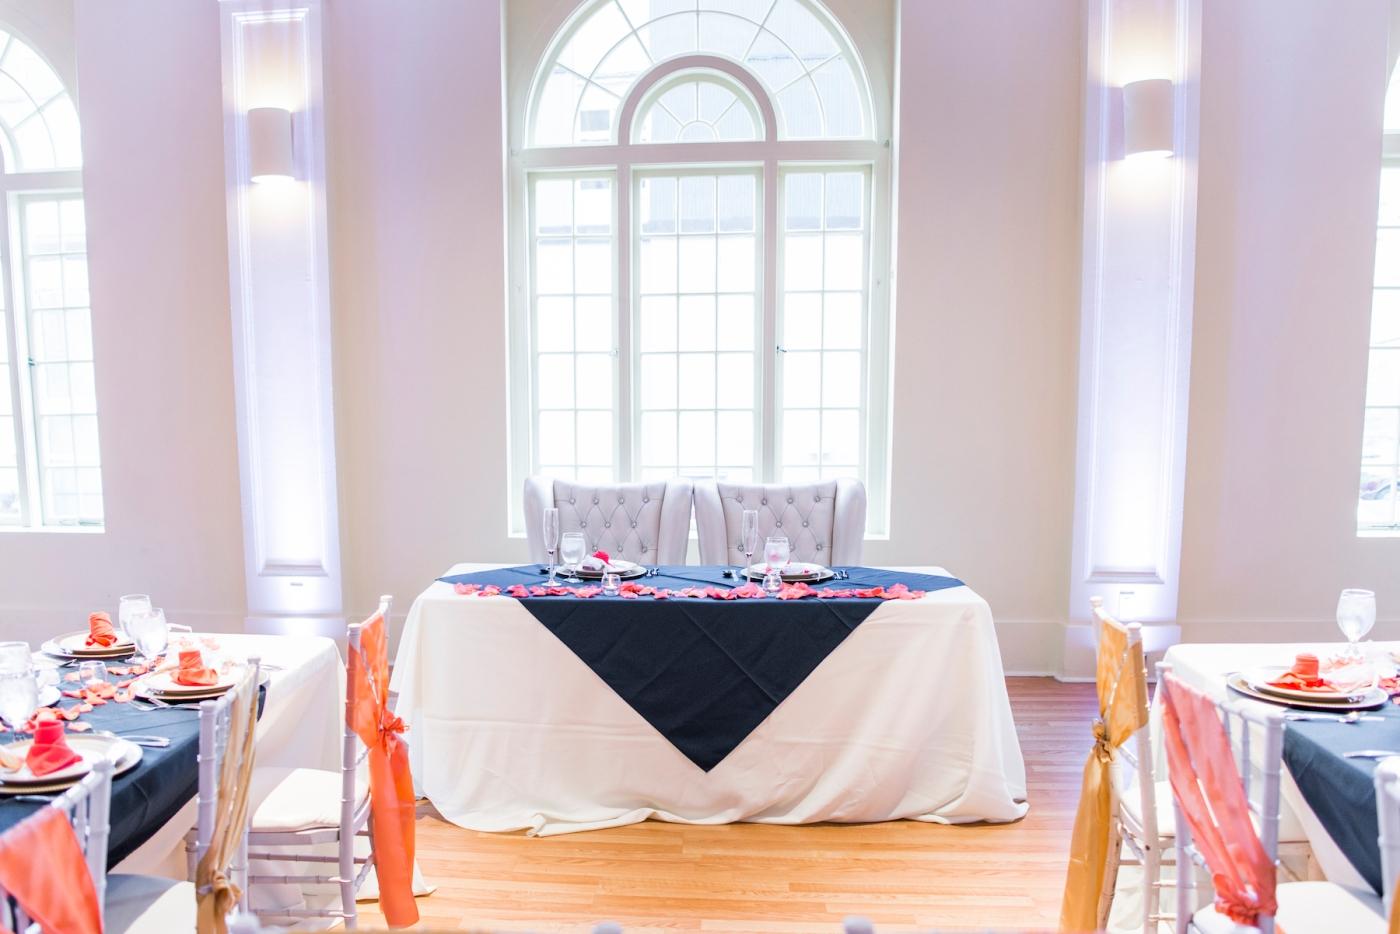 DSC_3078Everett_Wedding_Ballroom_Jane_Speleers_photography_Rachel_and_Edmund_cake cutting_2017